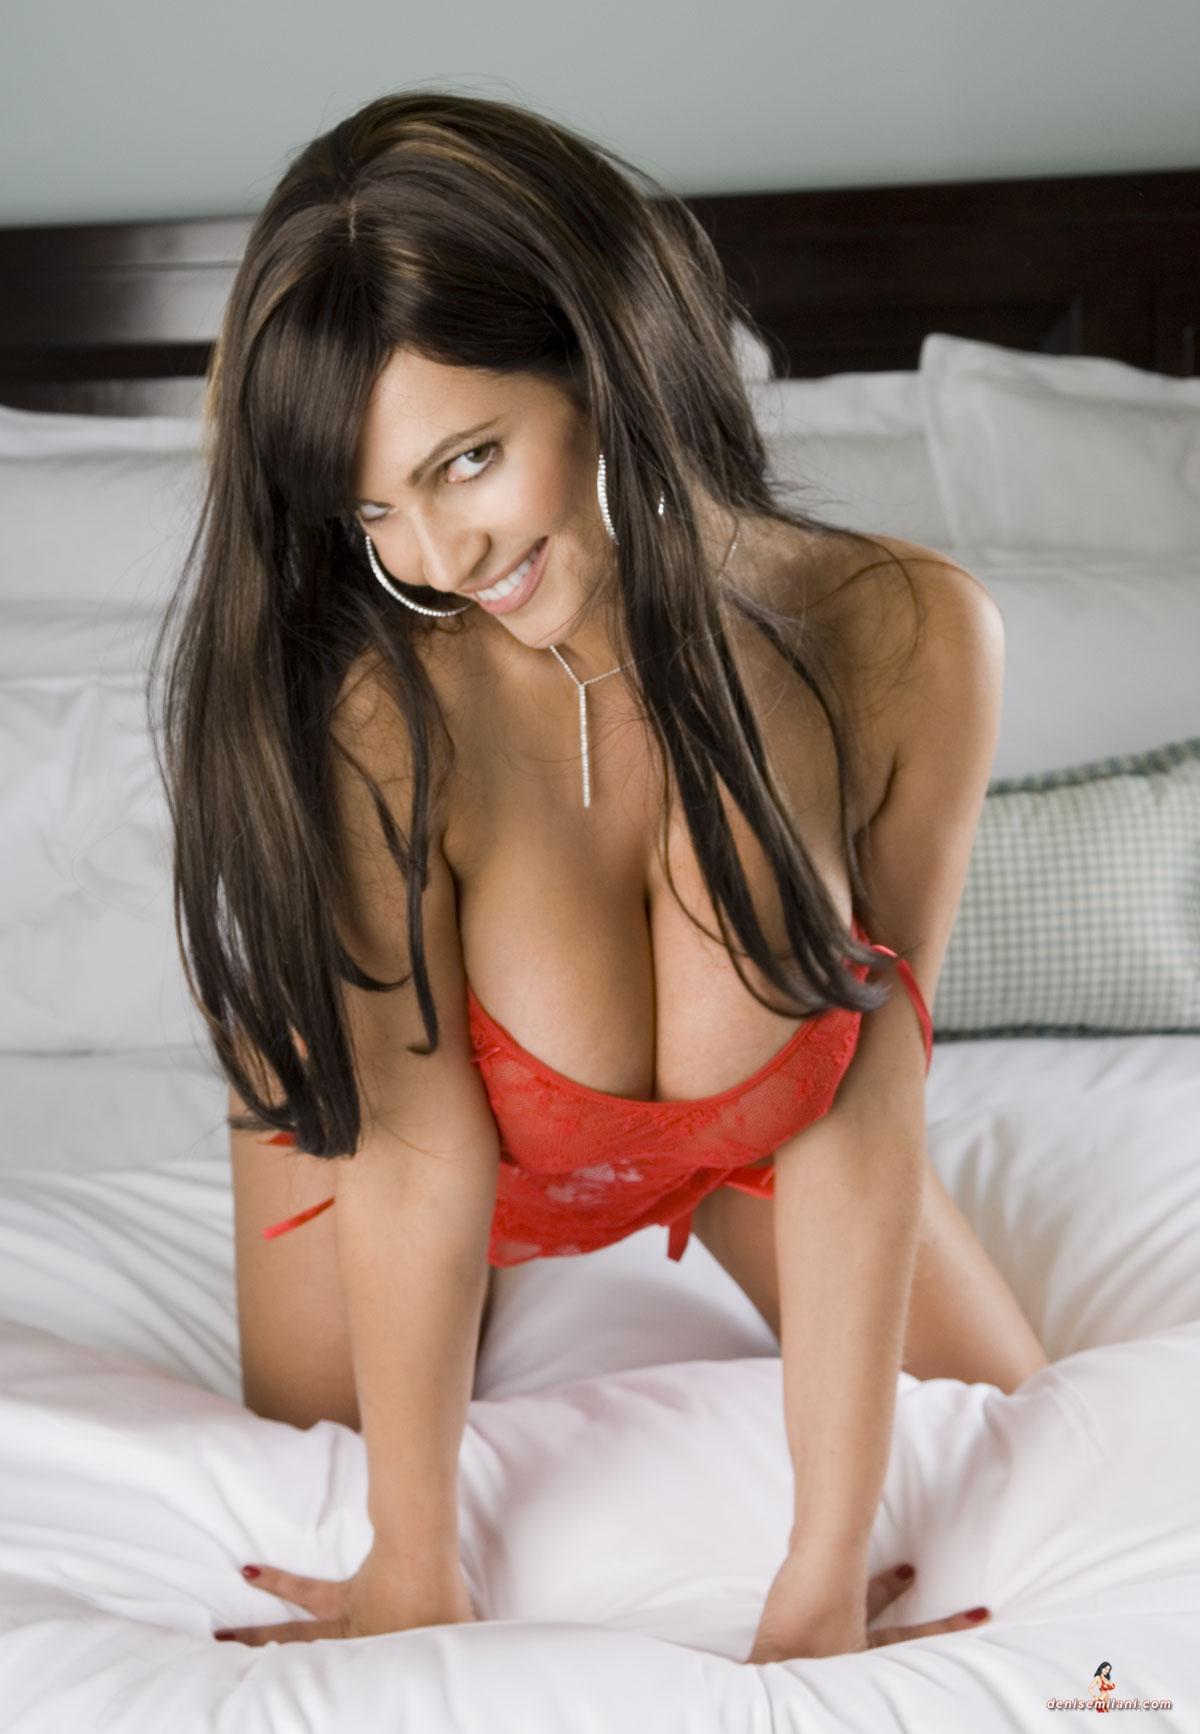 image Posing huge buttocks and stuffed legs 38pose3